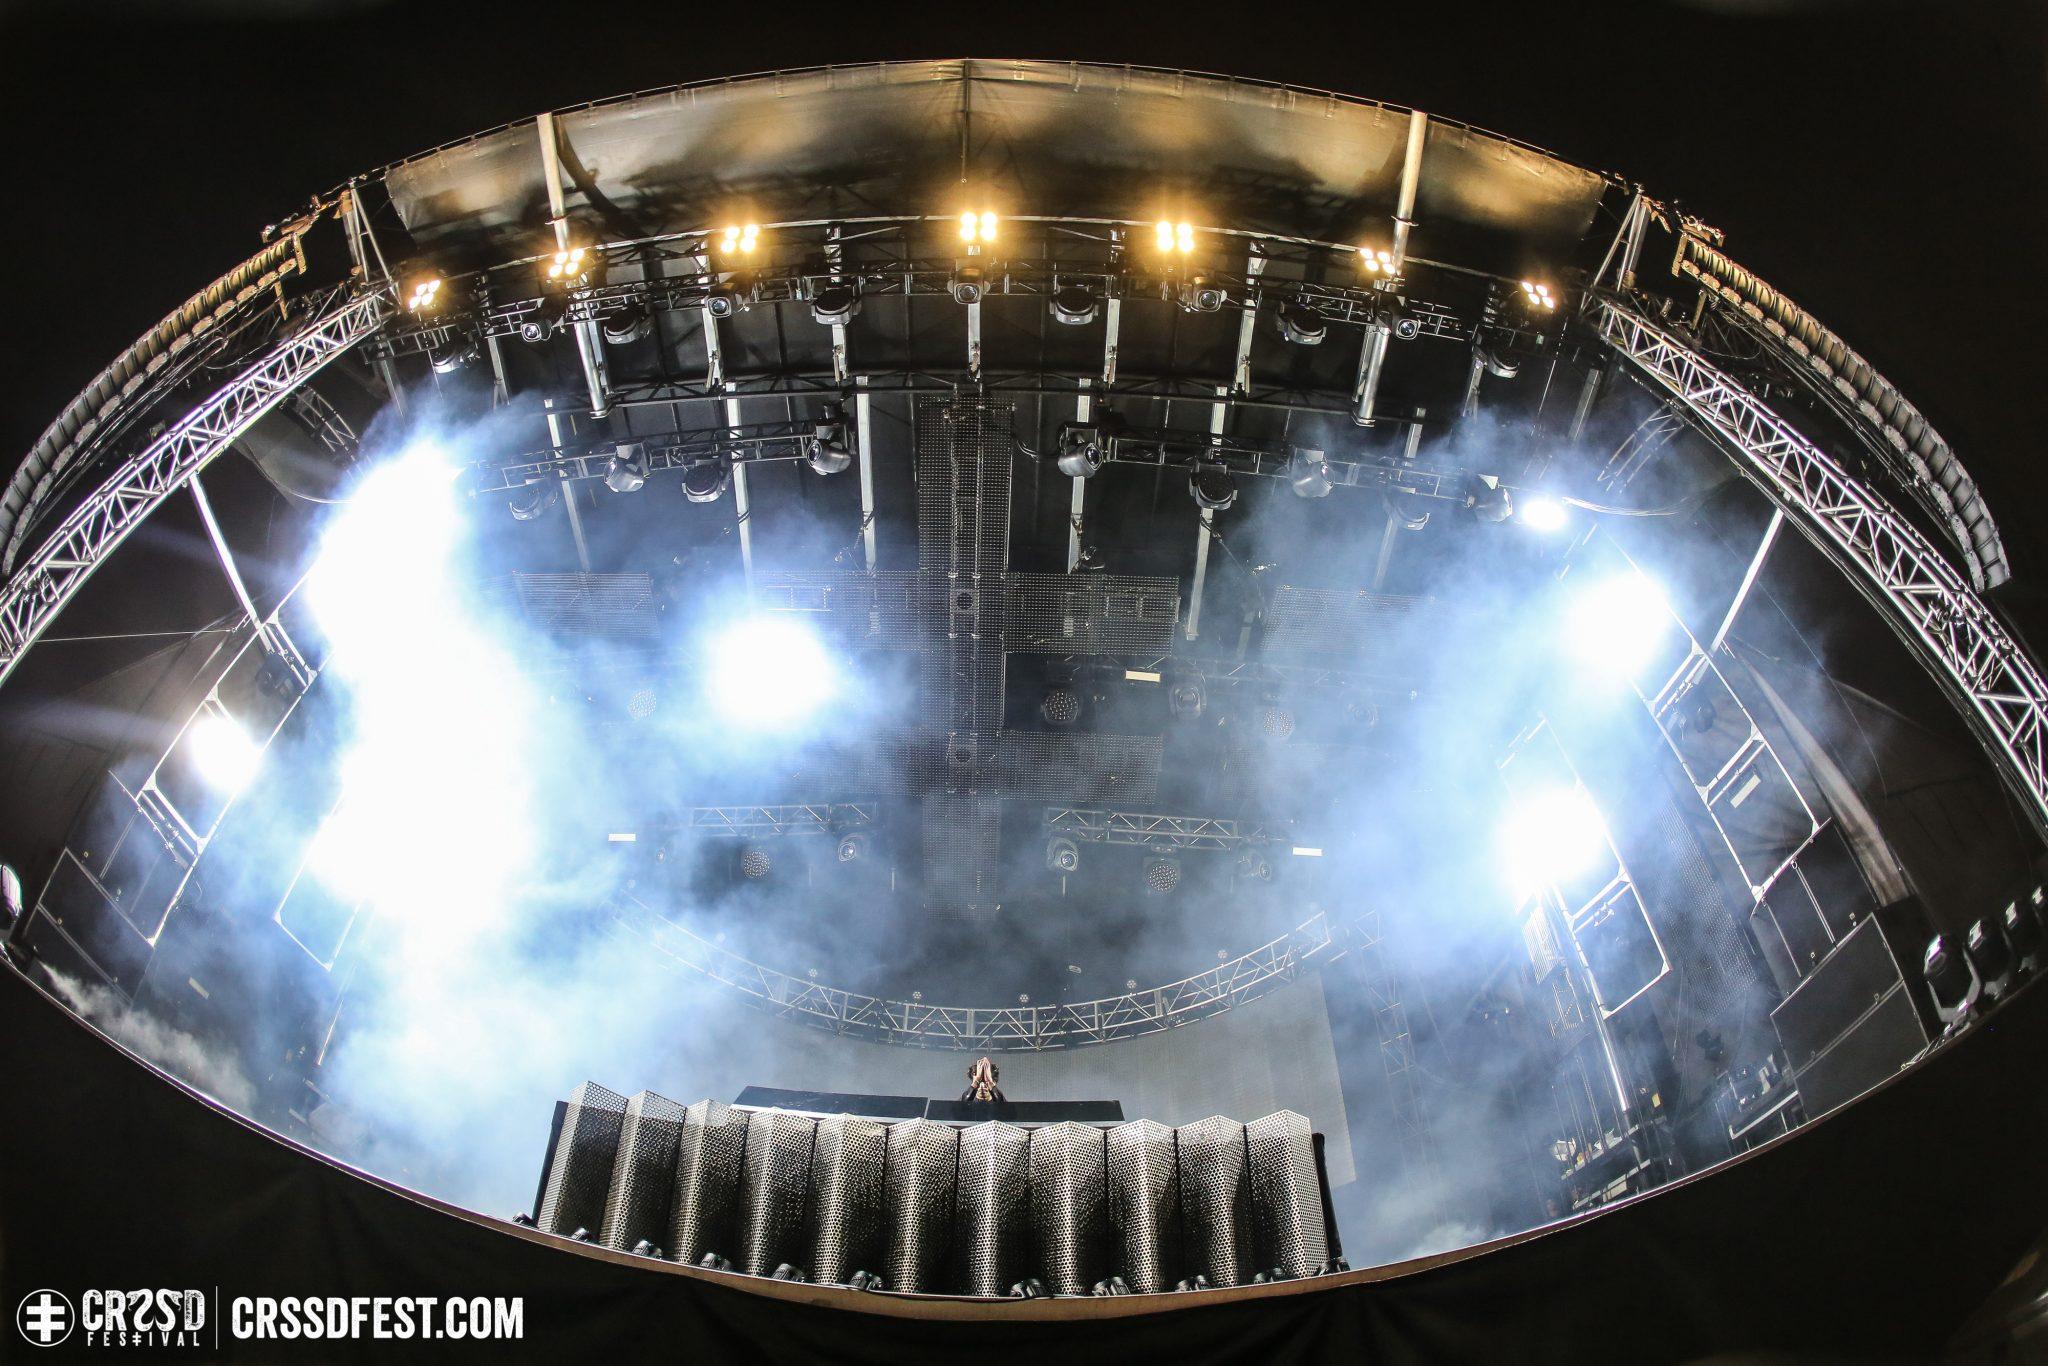 GESAFFELSTEIN DJ Set at the Ocean View Stage - Photo by Felicia Garcia